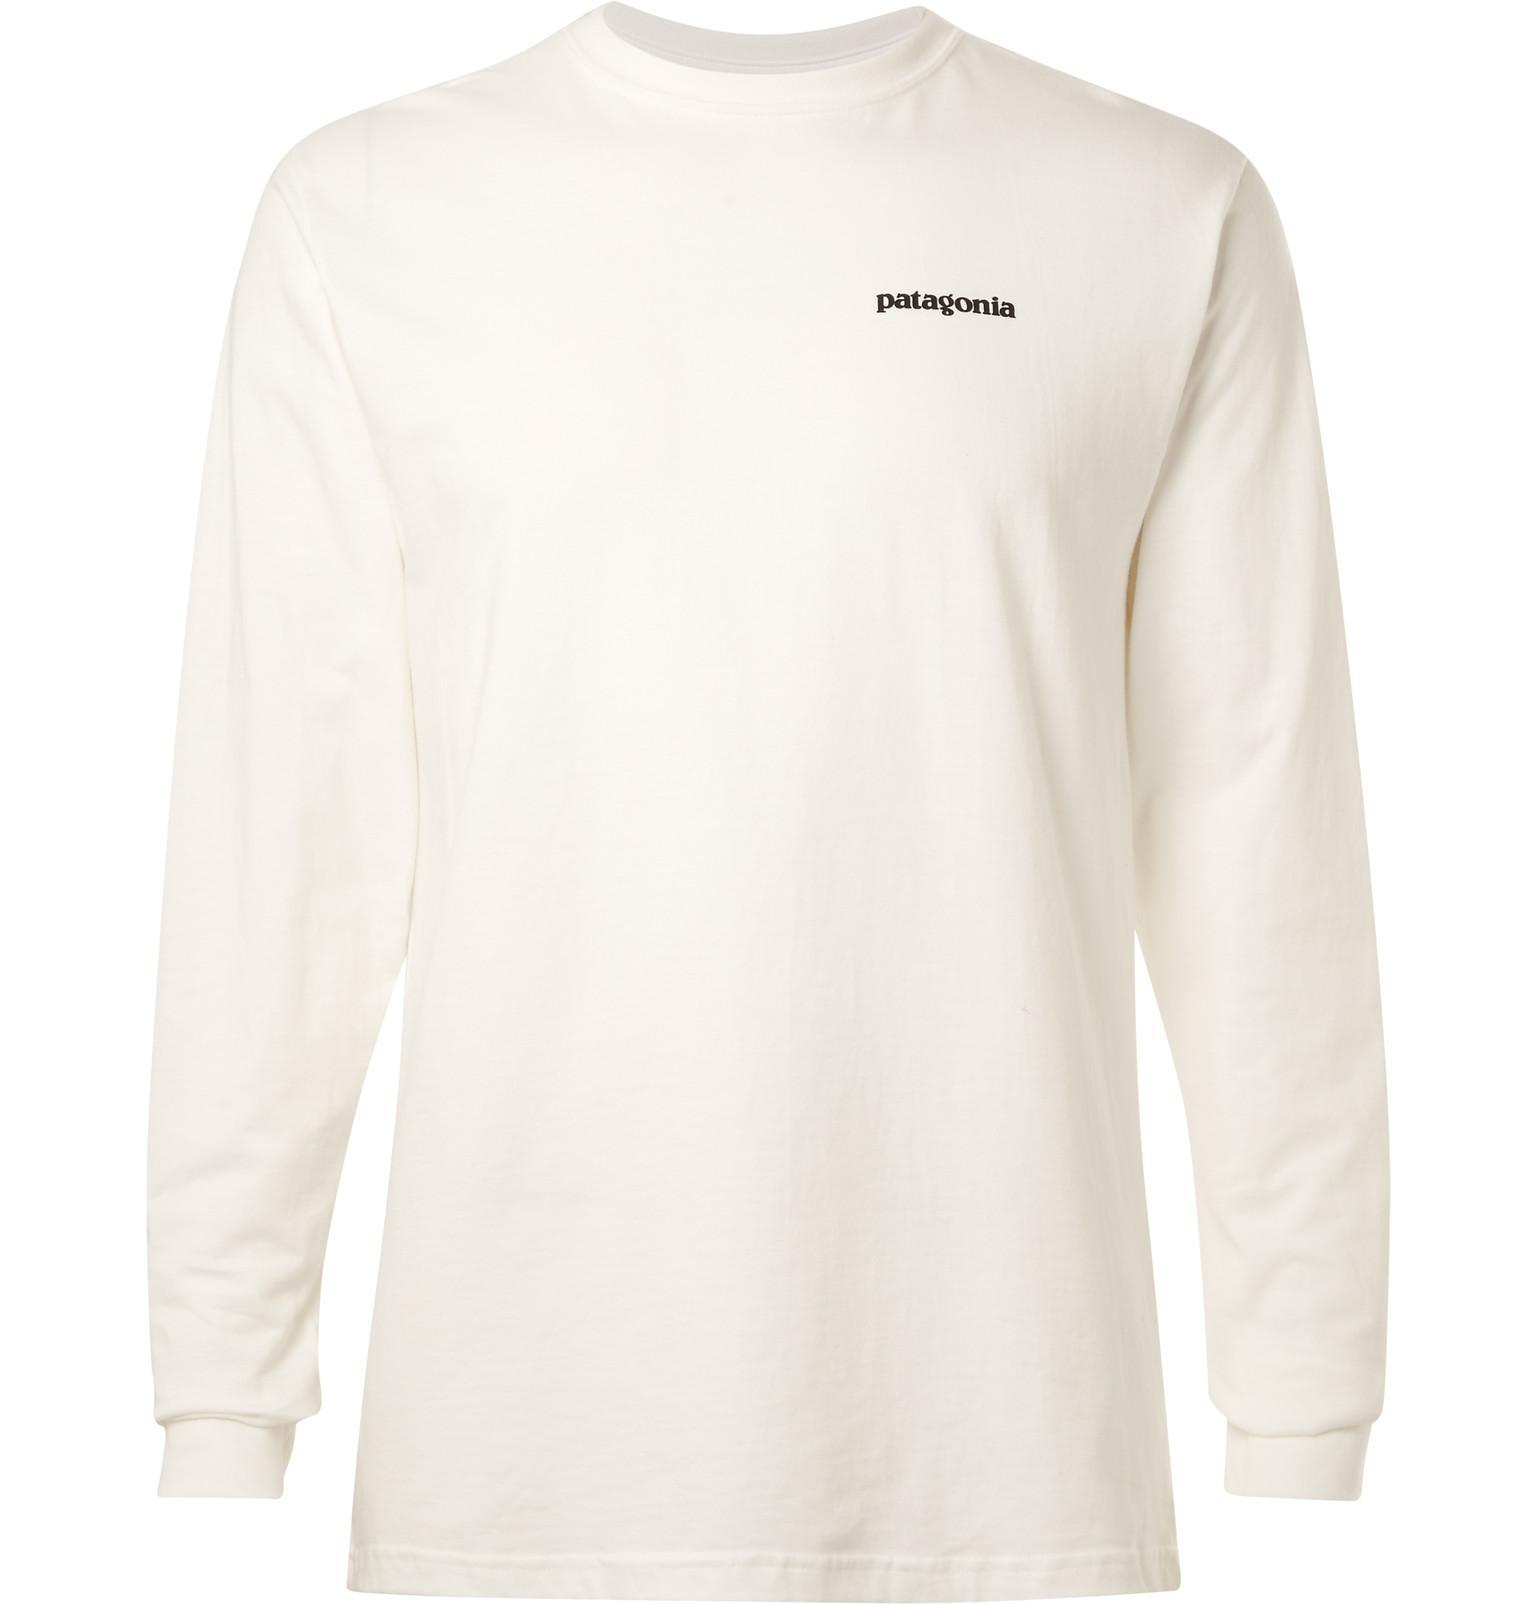 Lyst patagonia p 6 logo printed organic cotton jersey t for Organic cotton t shirt printing